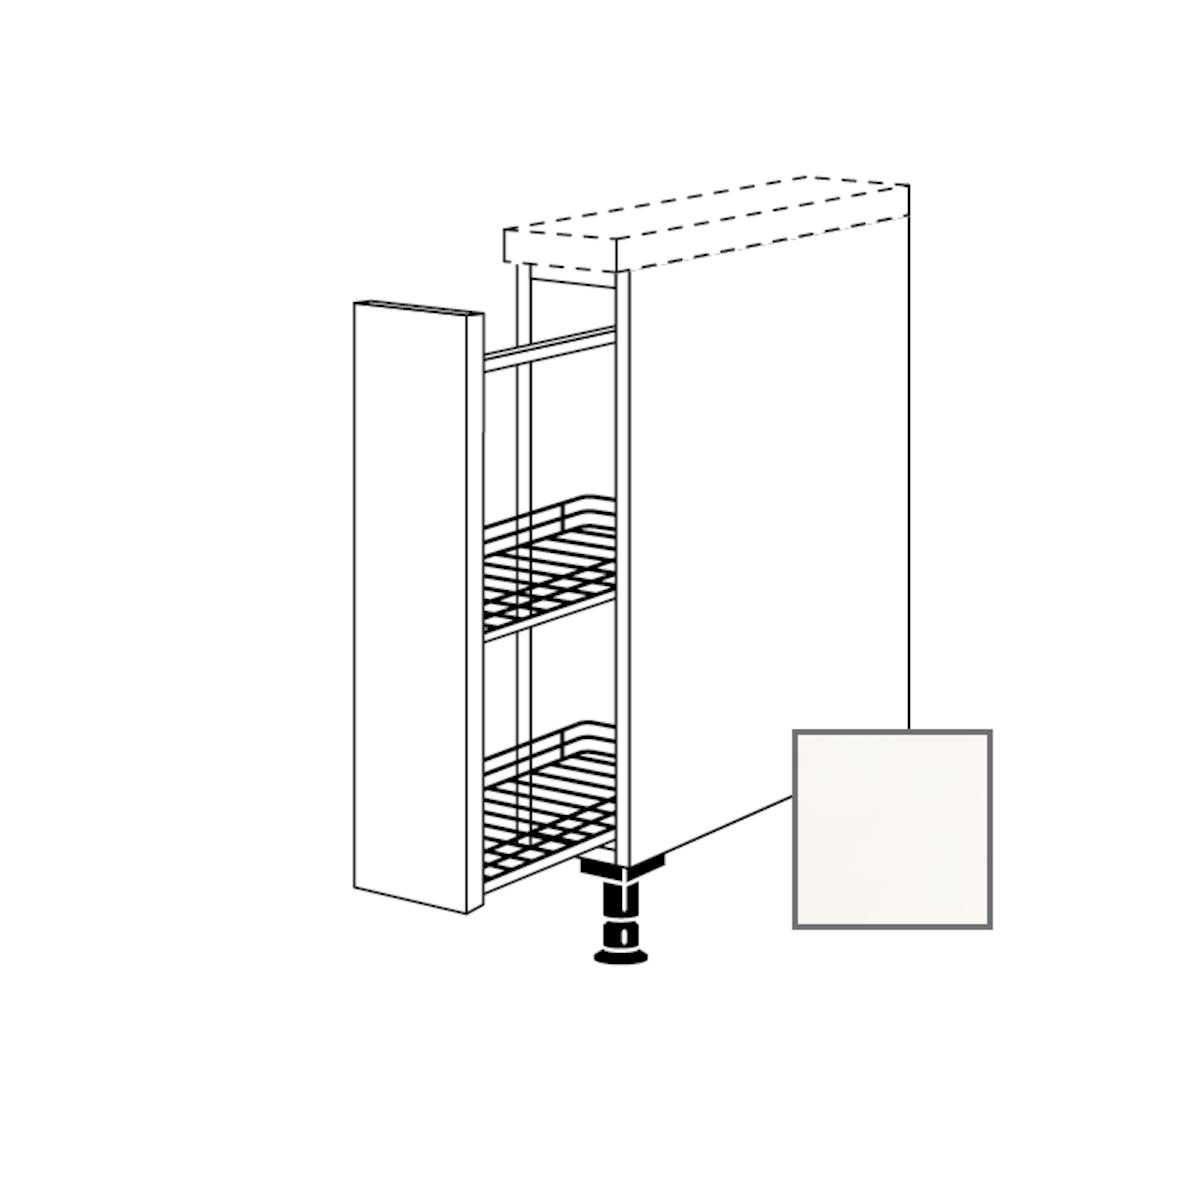 Kuchynská skrinka spodní Naturel Erika24 s výsuvným systémom 15x87x56 cm bílá lesk 450.UA15